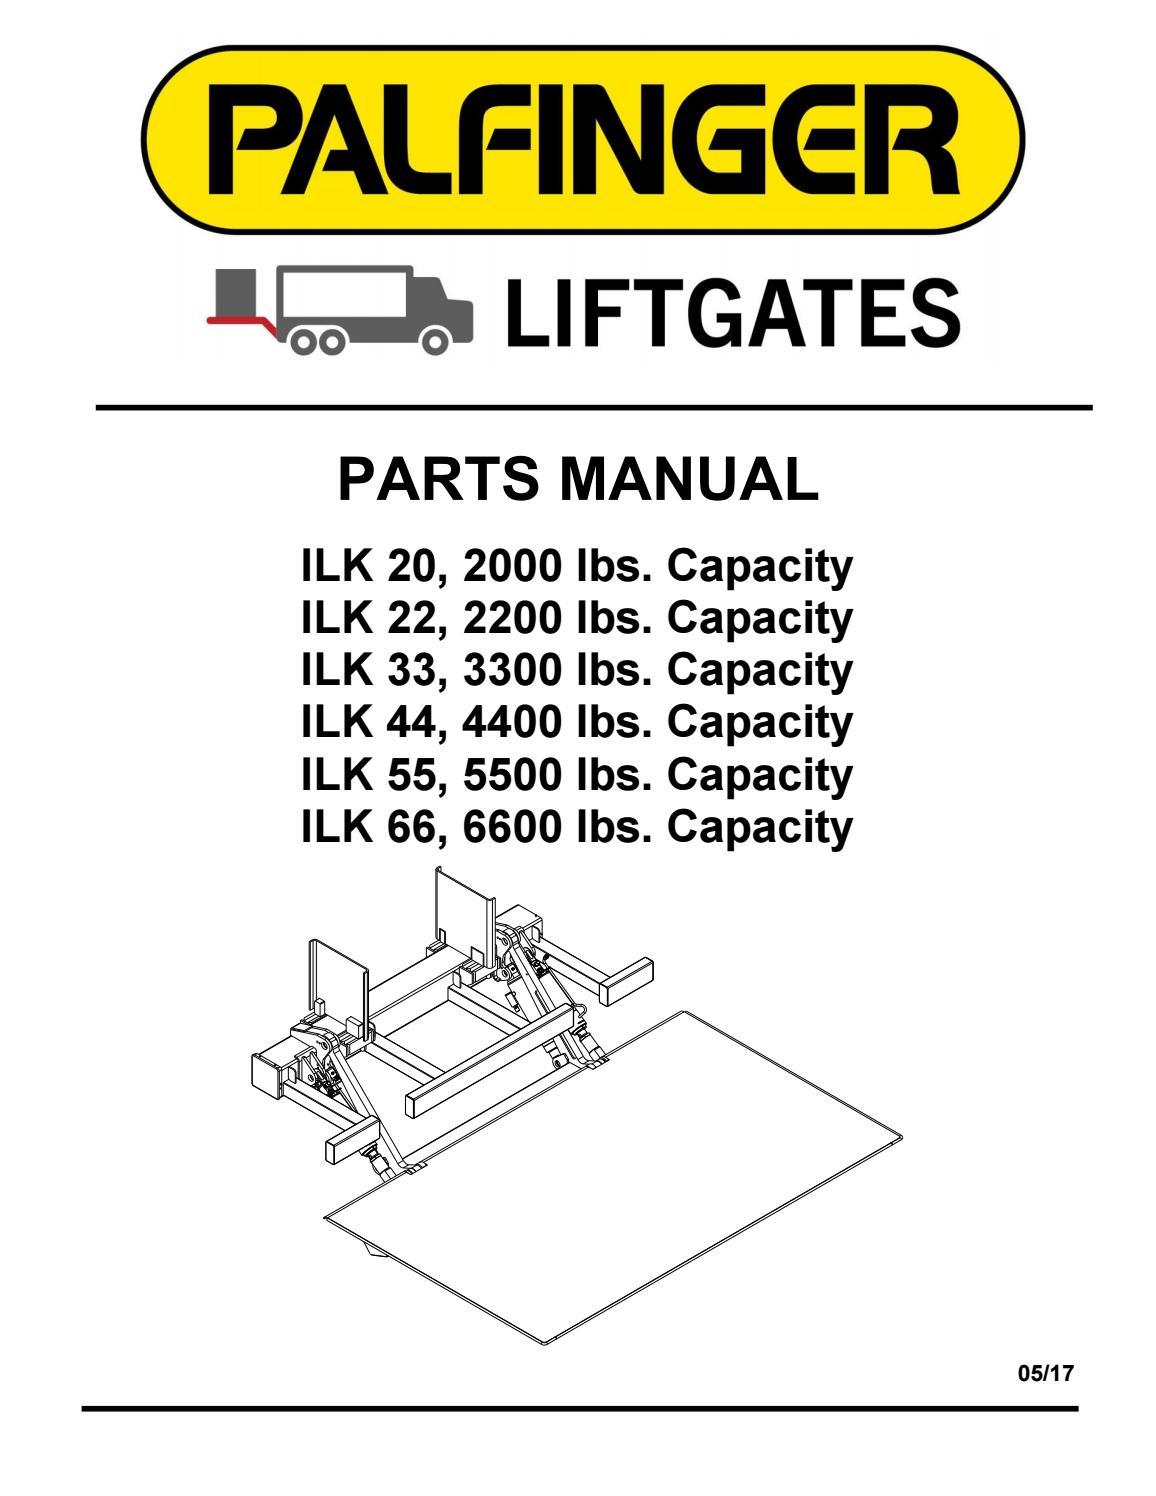 palfinger ilk-20, 22, 33, 44, 55, 66 liftgate parts manual